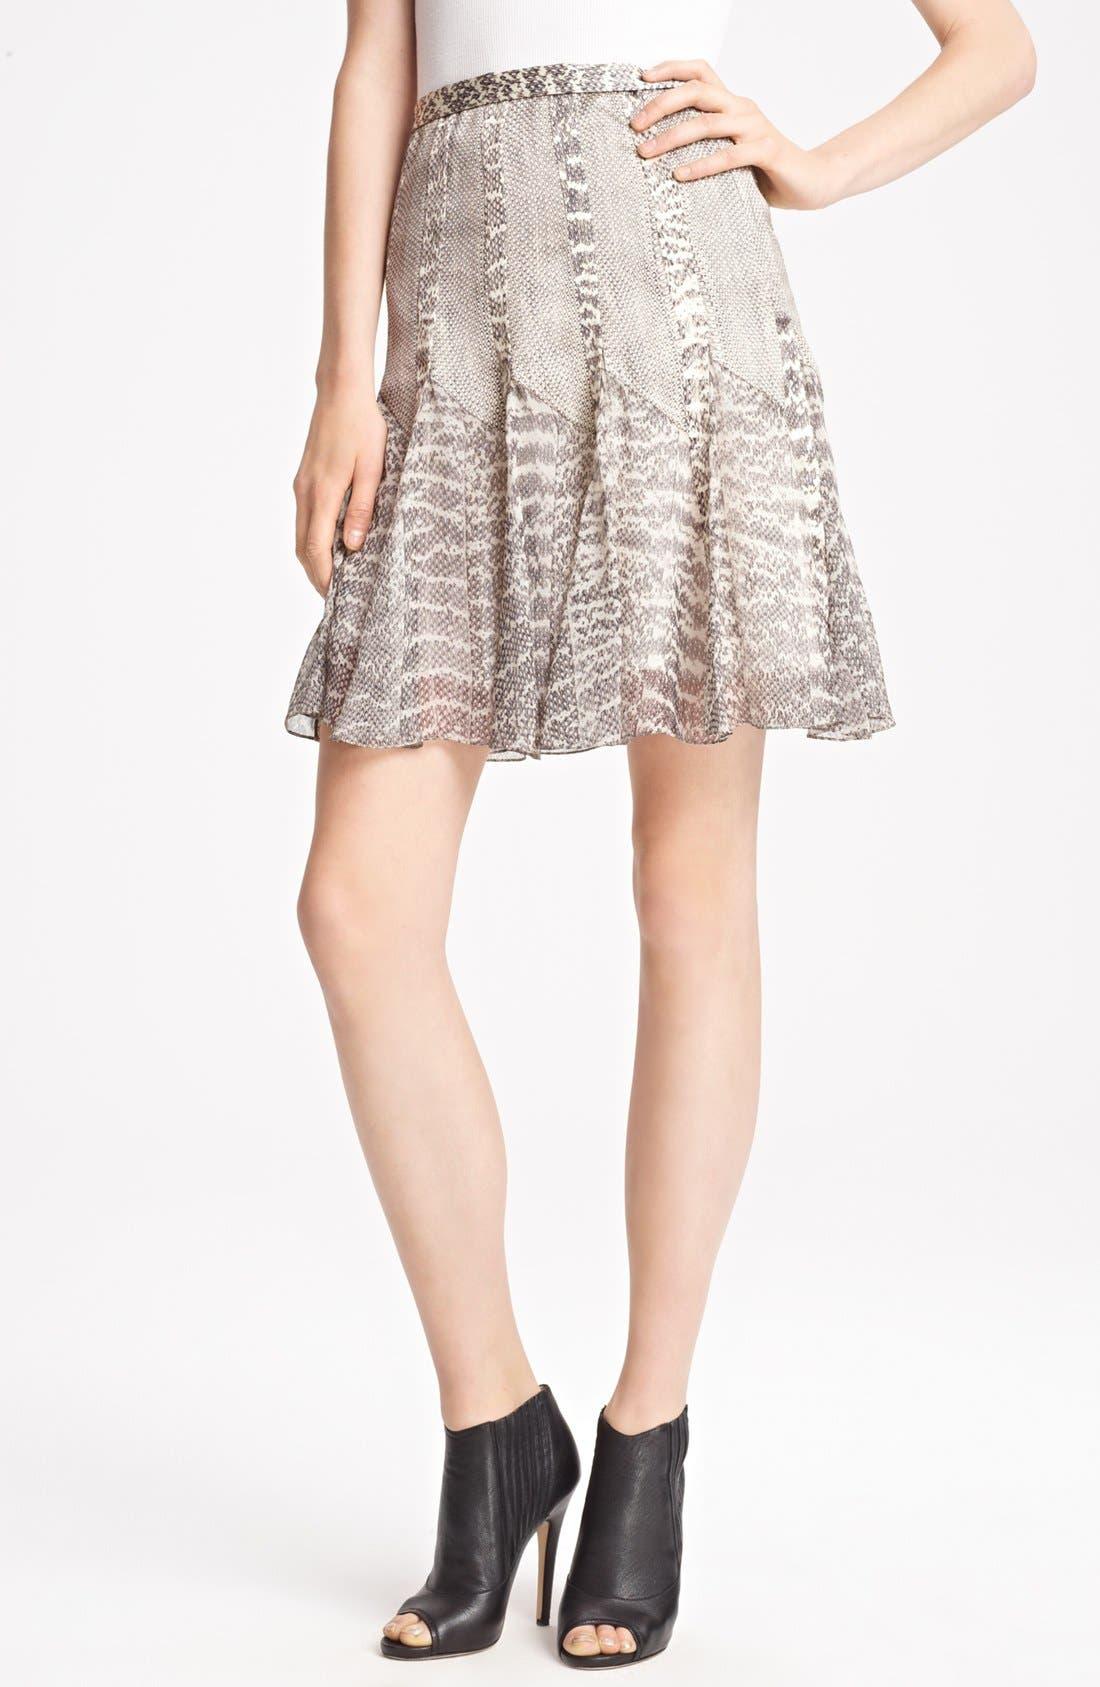 Main Image - Jason Wu Snakeskin Print Satin & Chiffon Skirt